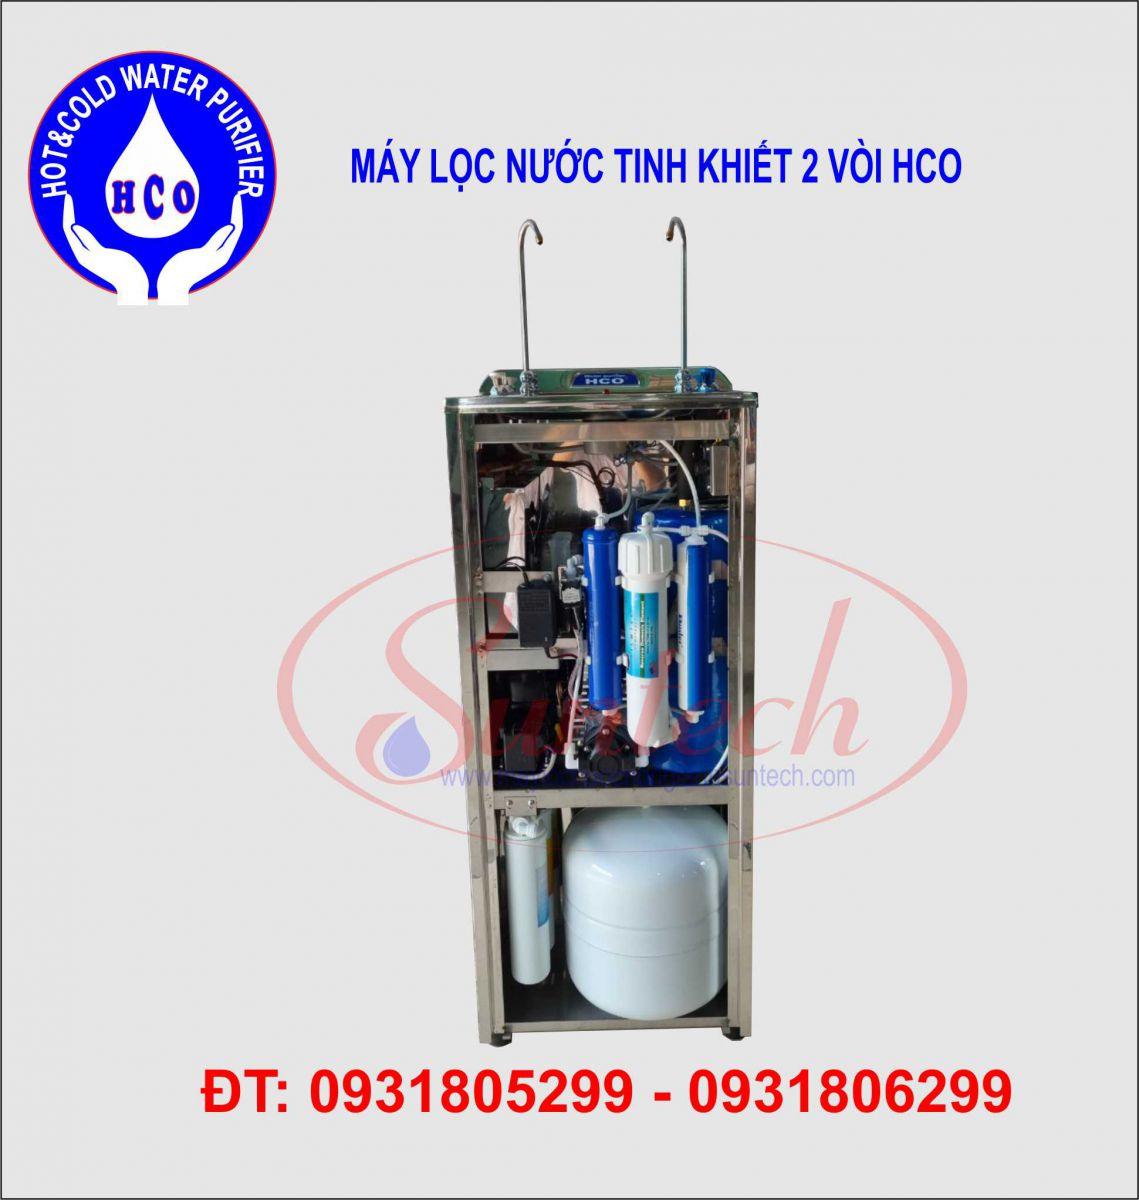 MAY-LOC-NUOC-TINH-KHIET-HCO-2-VOI-CO-TOT-KHONG